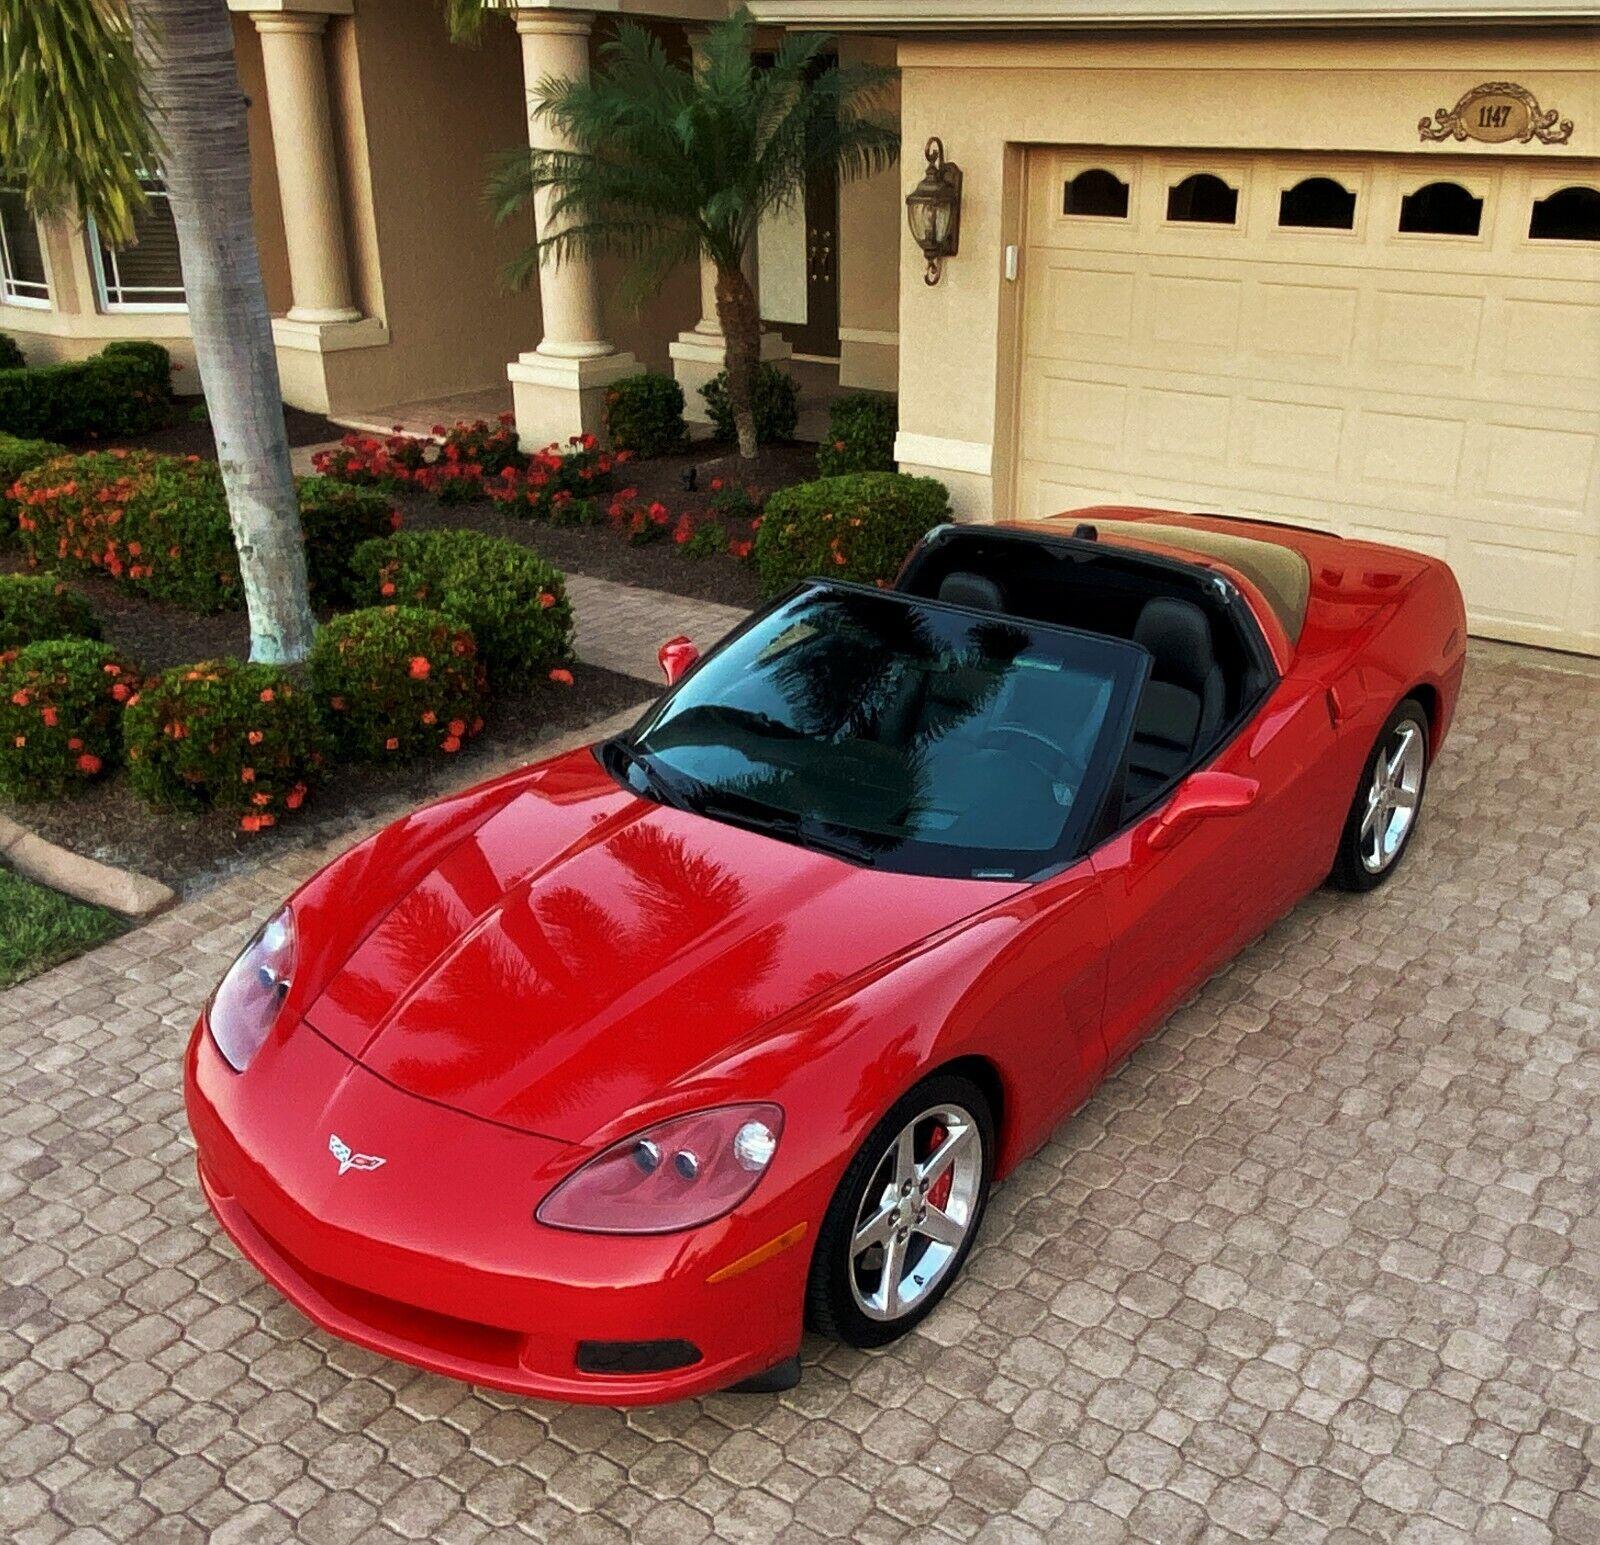 2005 Red Chevrolet Corvette     C6 Corvette Photo 1